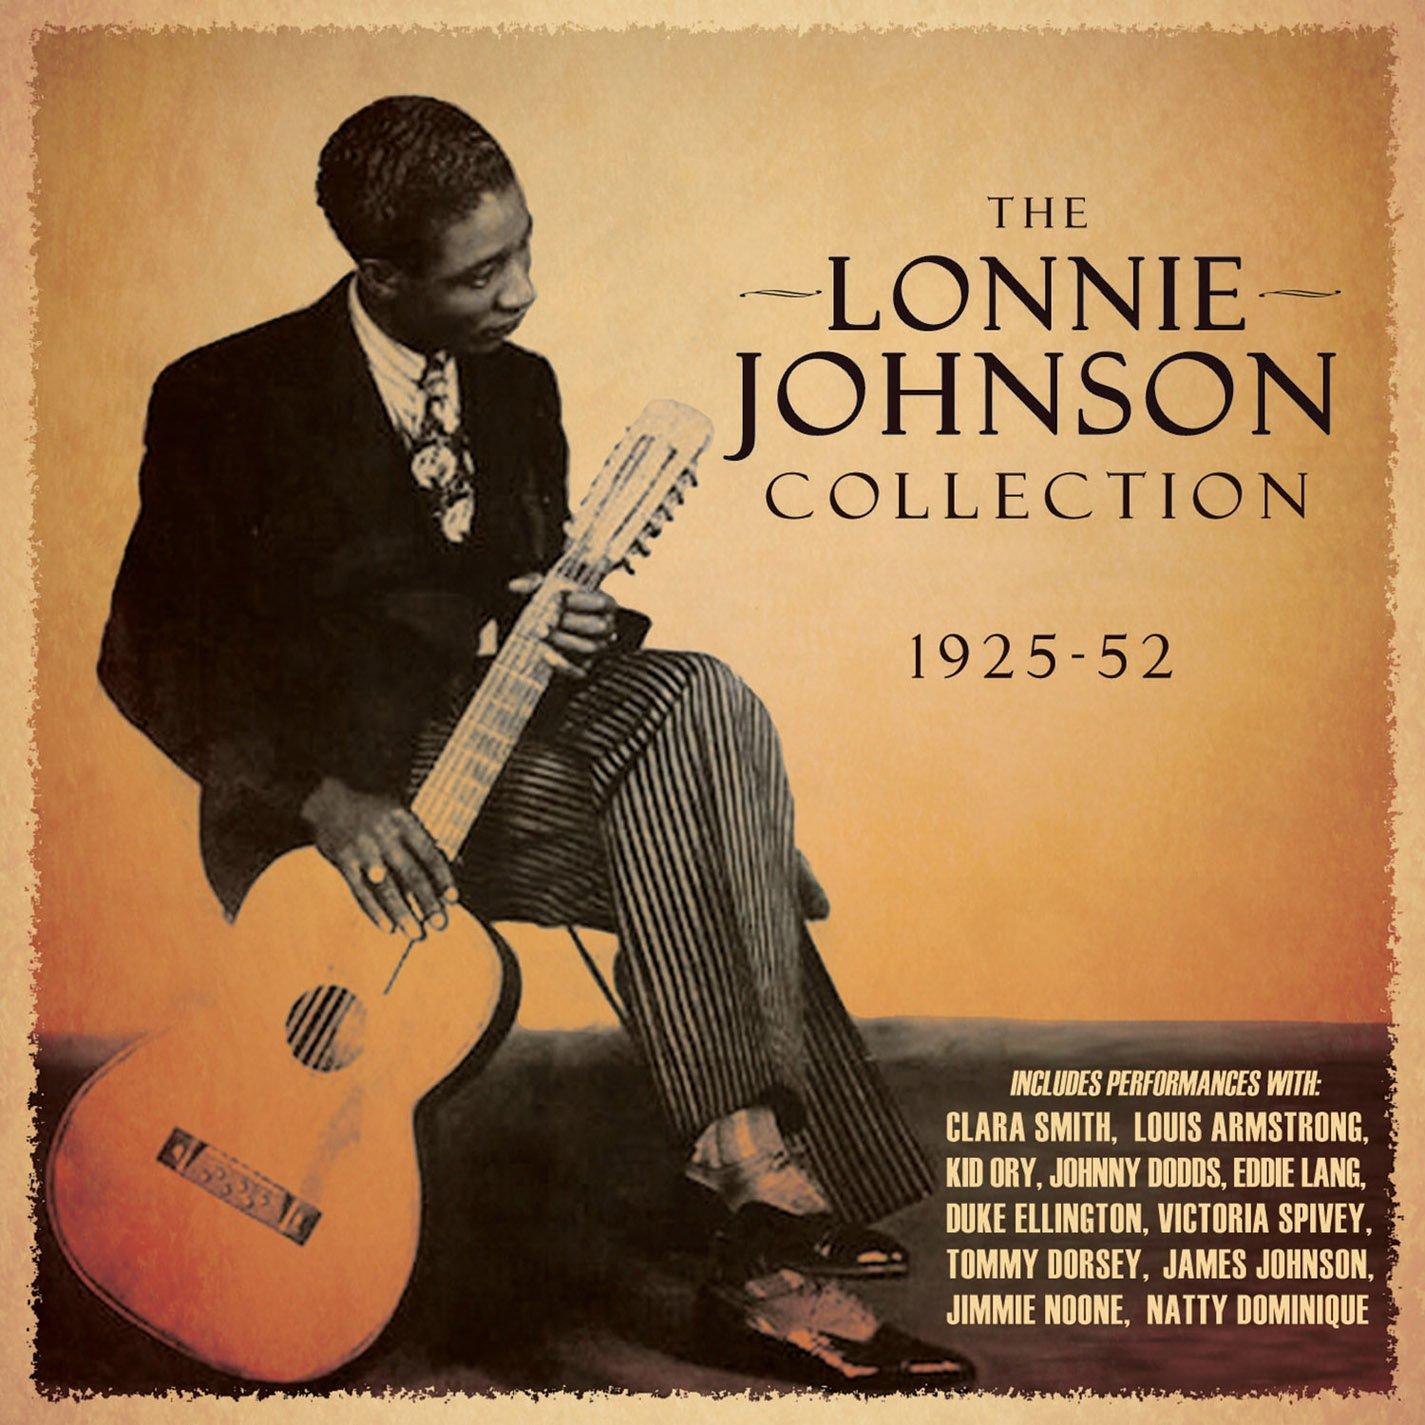 Johnson, Lonnie - Collection: 1925-52 - Amazon.com Music